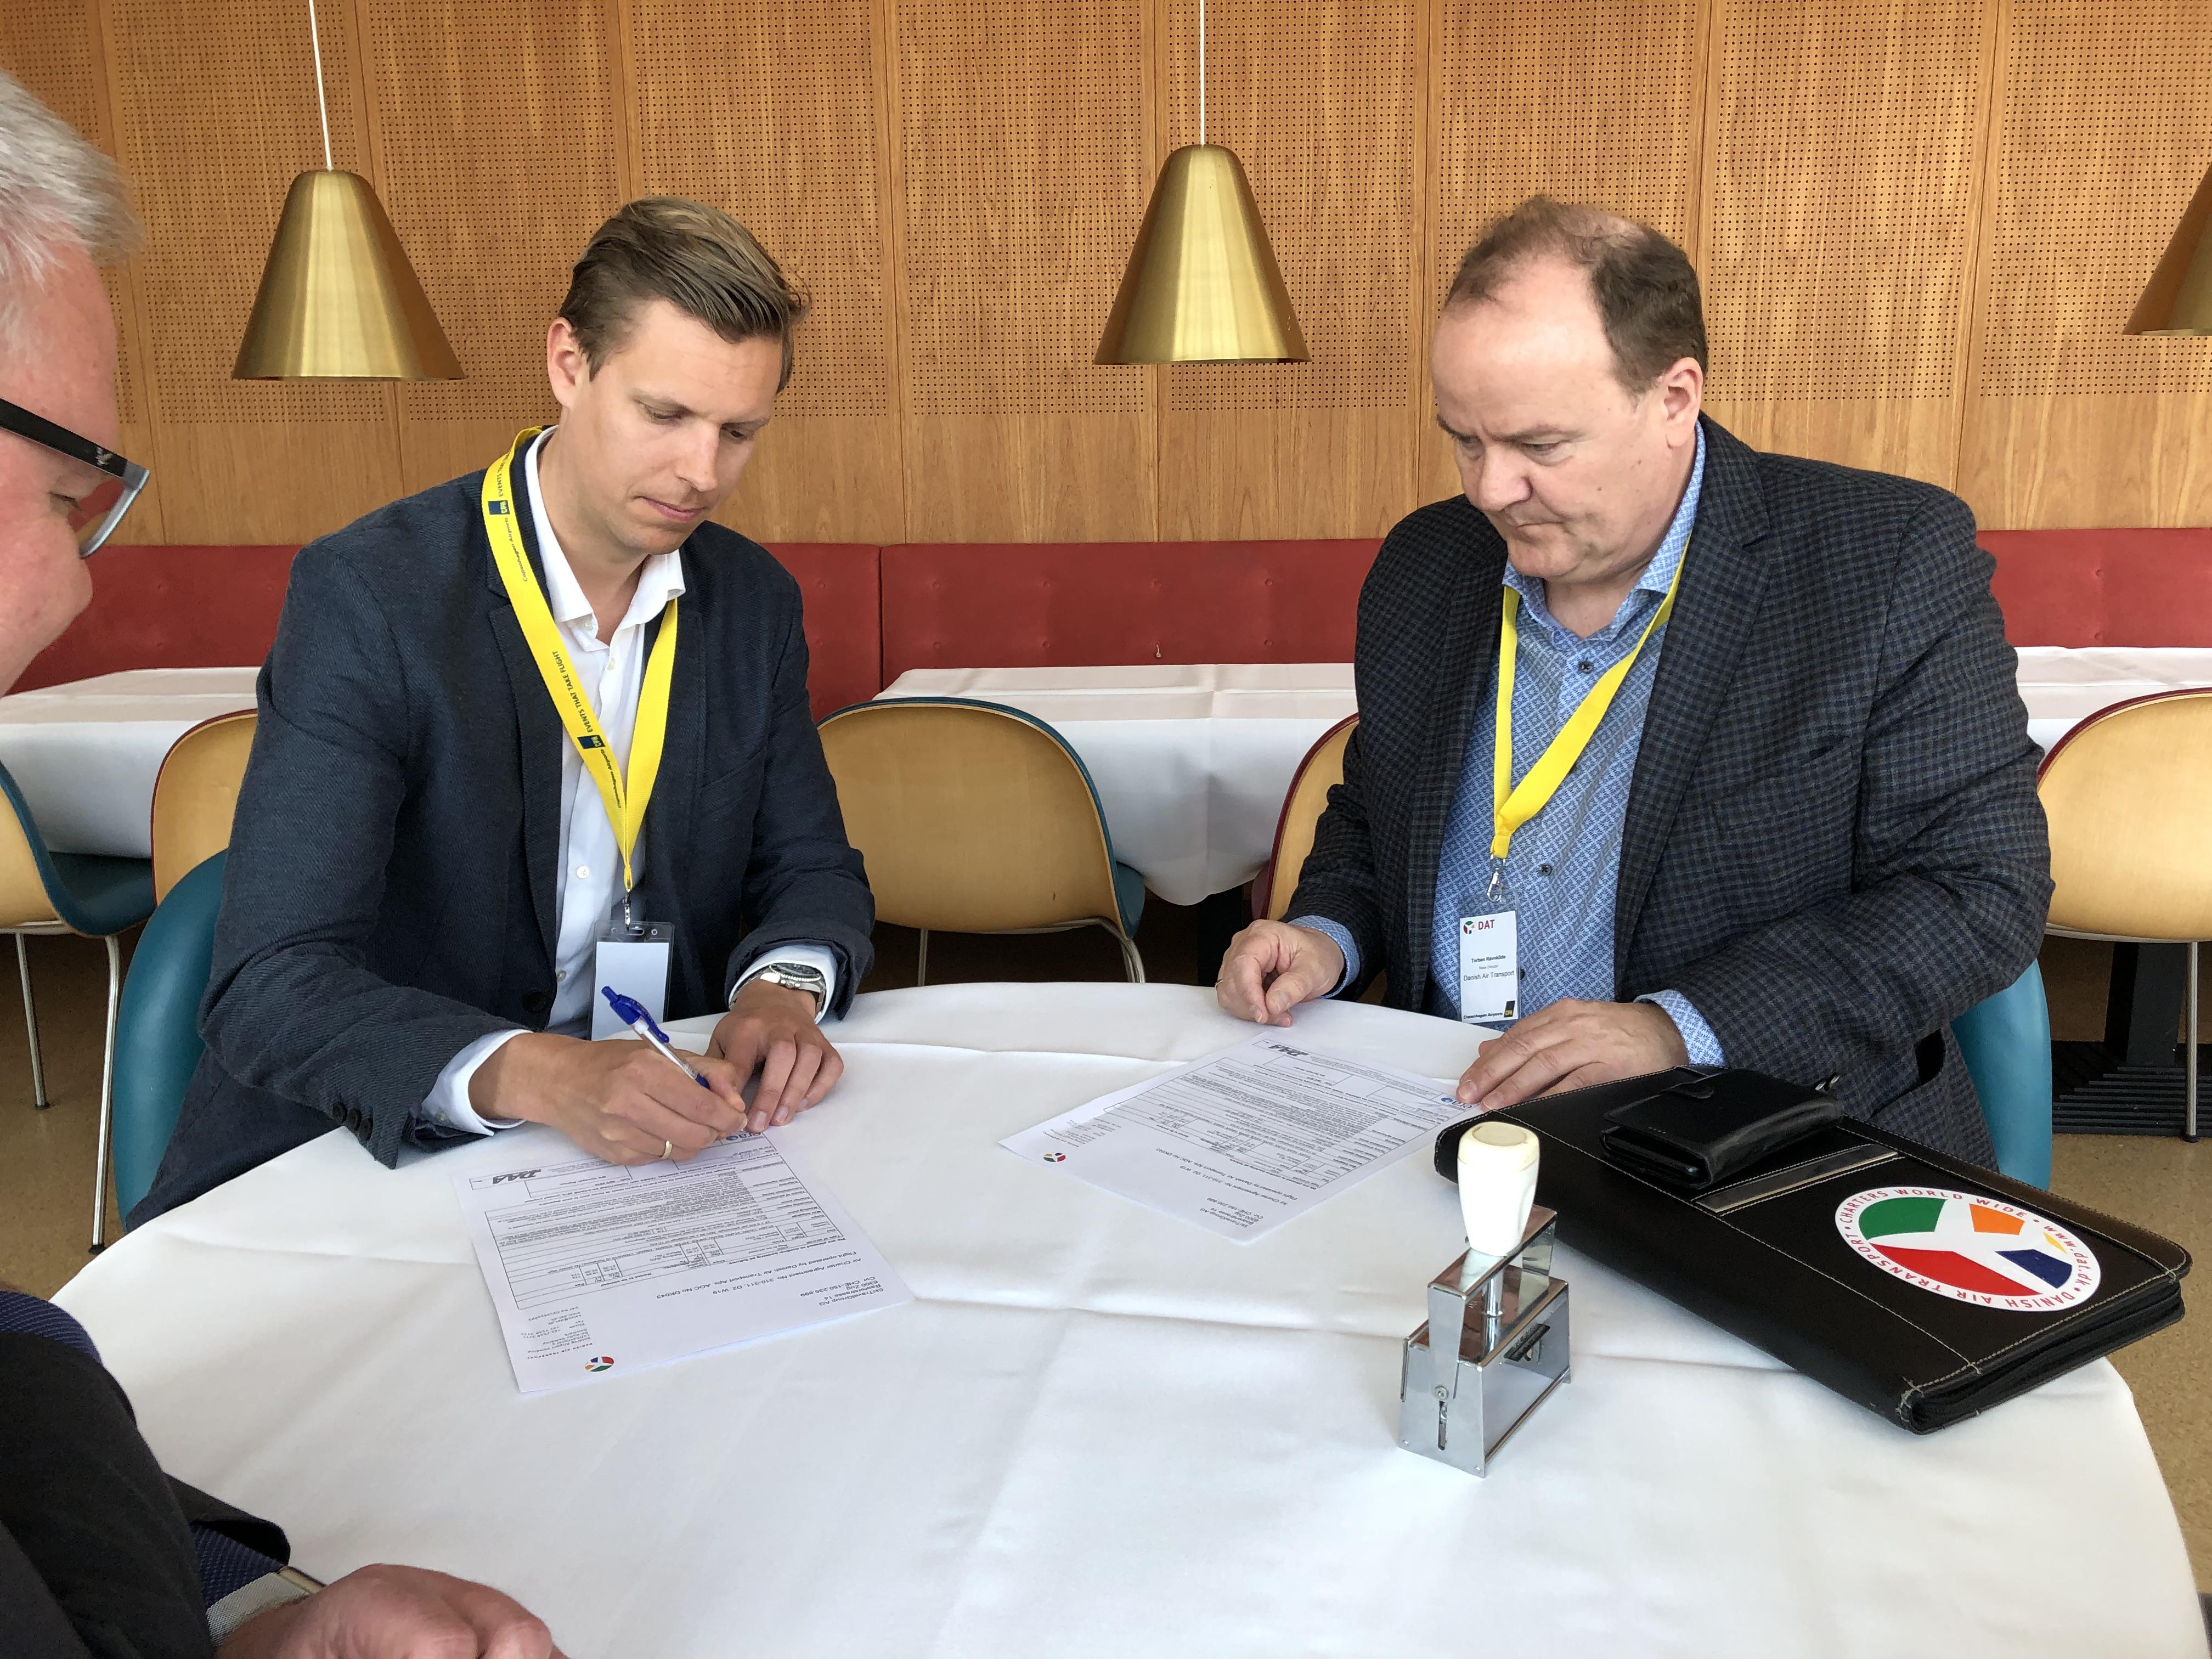 Peter Jørgensen fra SkiTravelGroup (til venstre) og Torben Ravnkilde fra DAT. (Foto: Søren Hedegaard Nielsen)